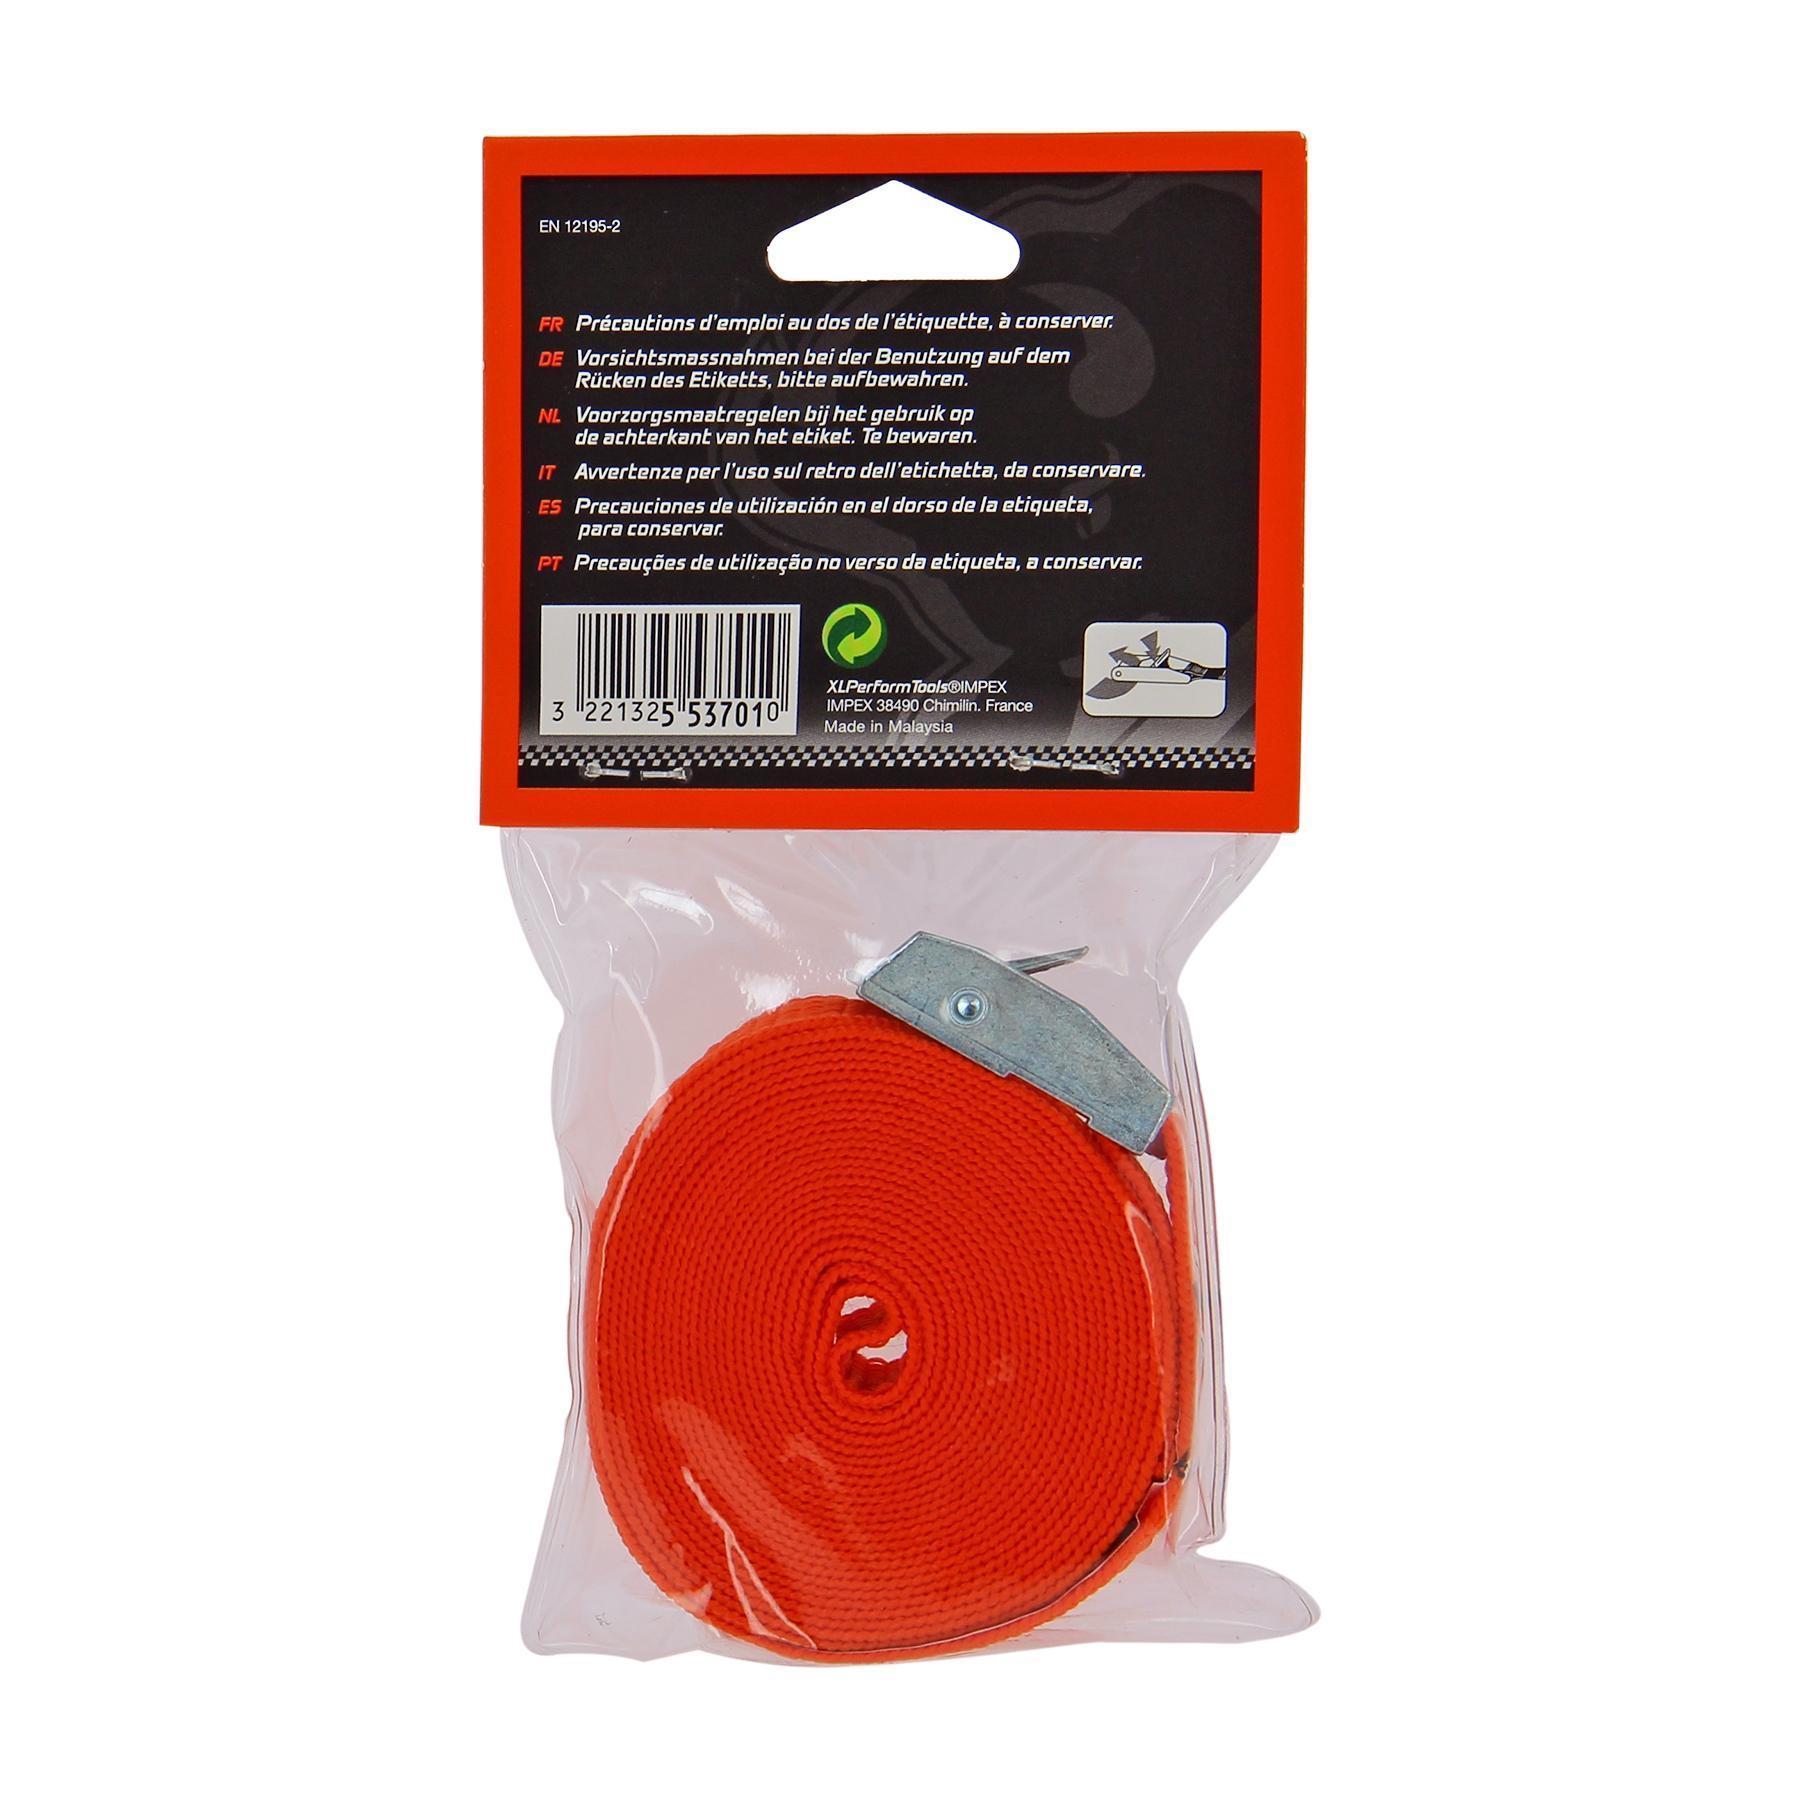 Lyftstroppar / stroppar XL 553701 3221325537010